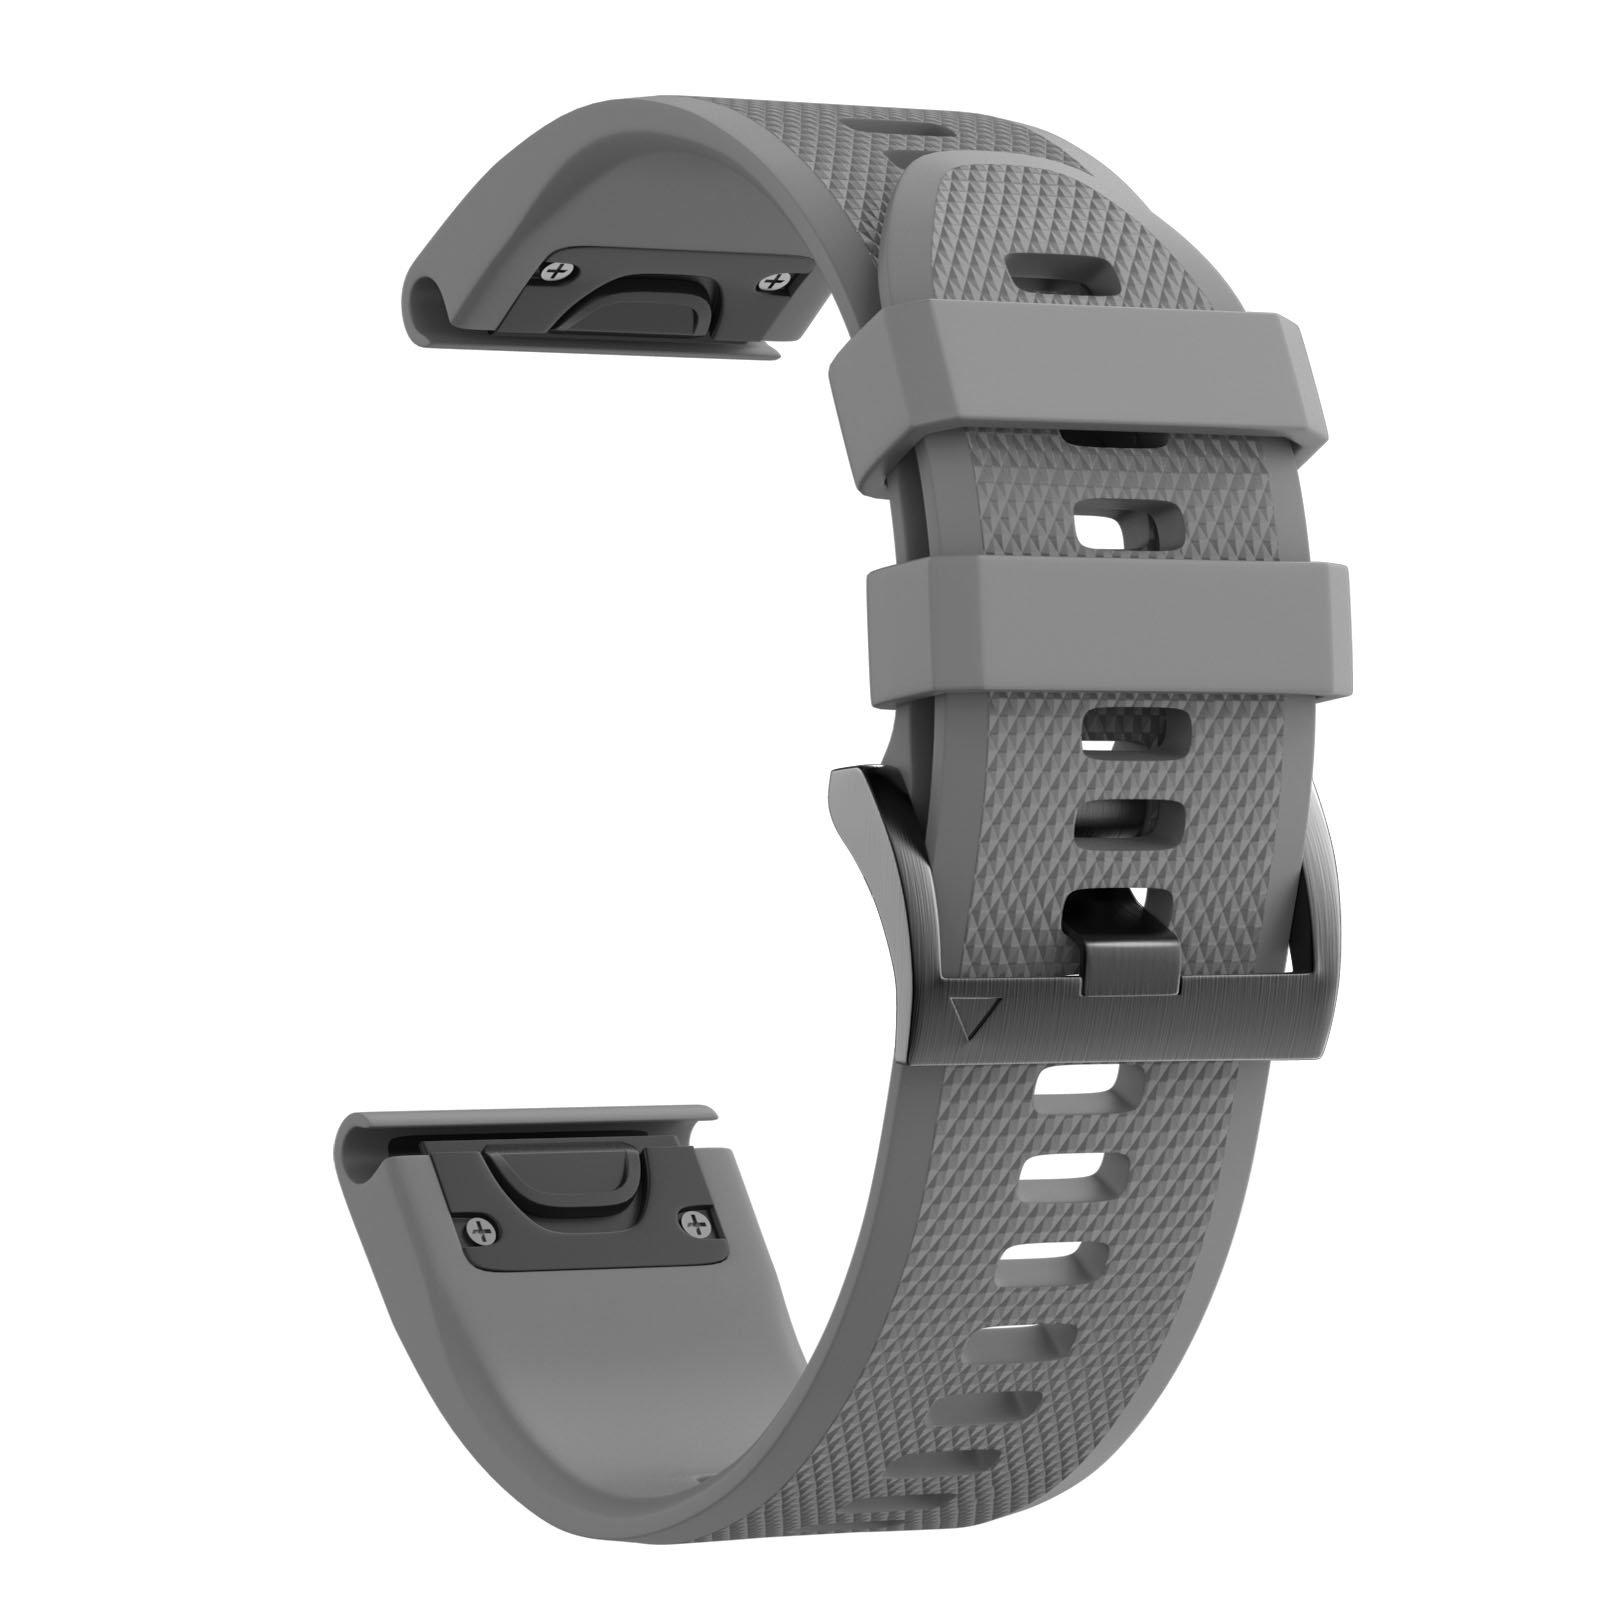 ANCOOL Compatible Garmin Fenix 5 Band Easy Fit 22mm Width Soft Silicone Watch Strap Compatible Garmin Fenix 5/Fenix 5 Plus/Forerunner 935/Approach S60/Quatix 5 - Grey